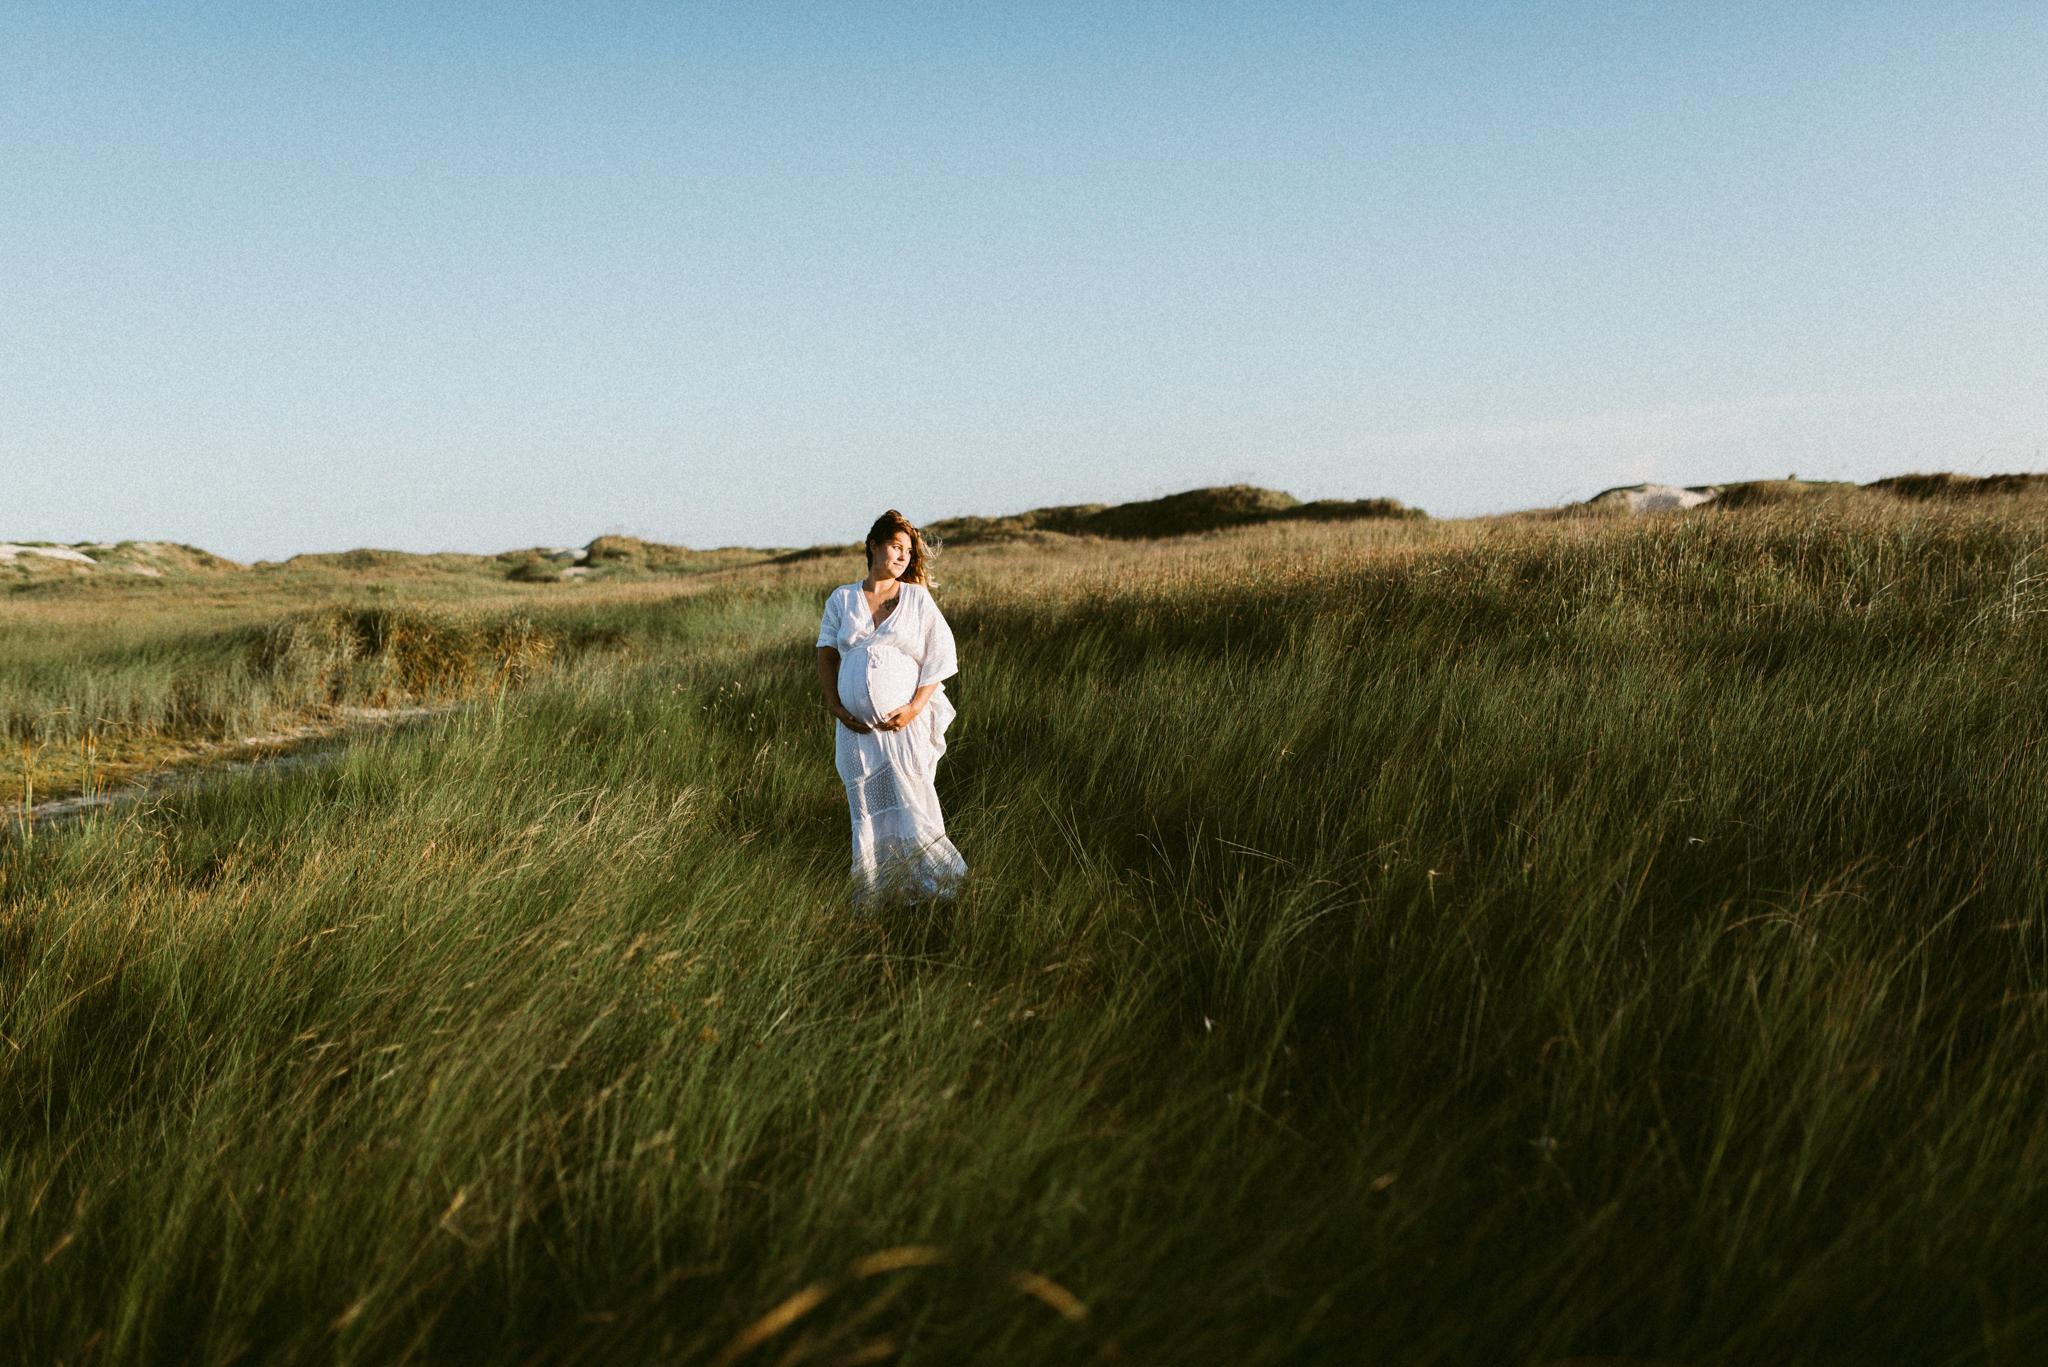 intimate motherhood maternity session corpus christi photographer kerlyn van gelder photography lifestyle